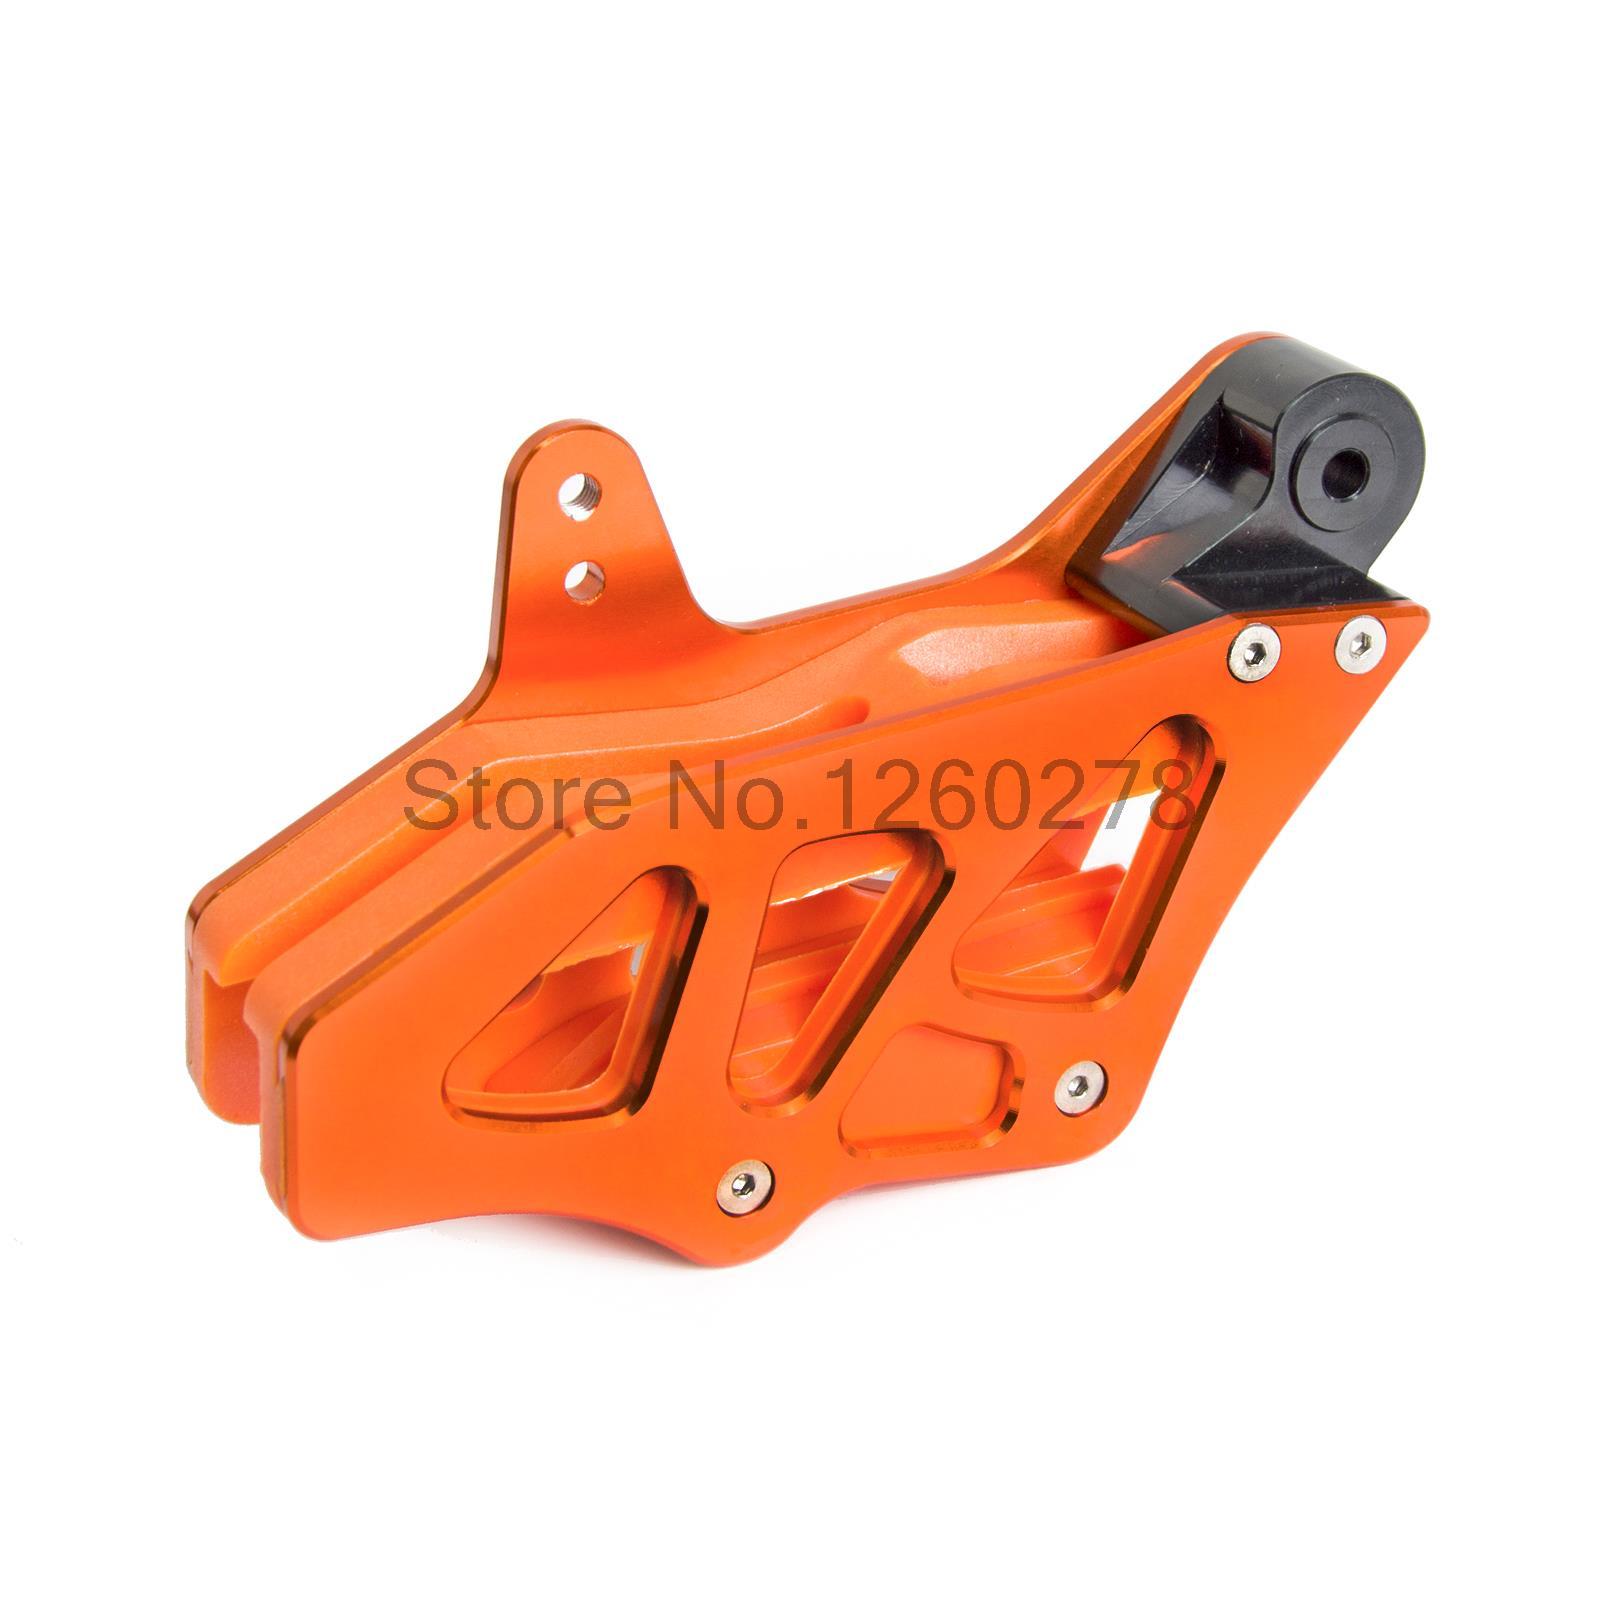 Купить ЧПУ Направляющая Цепи Подходит Для KTM 690 ENDURO R/ABS 690 SMC/R/ABS 2010 2011 2012 2013 2014